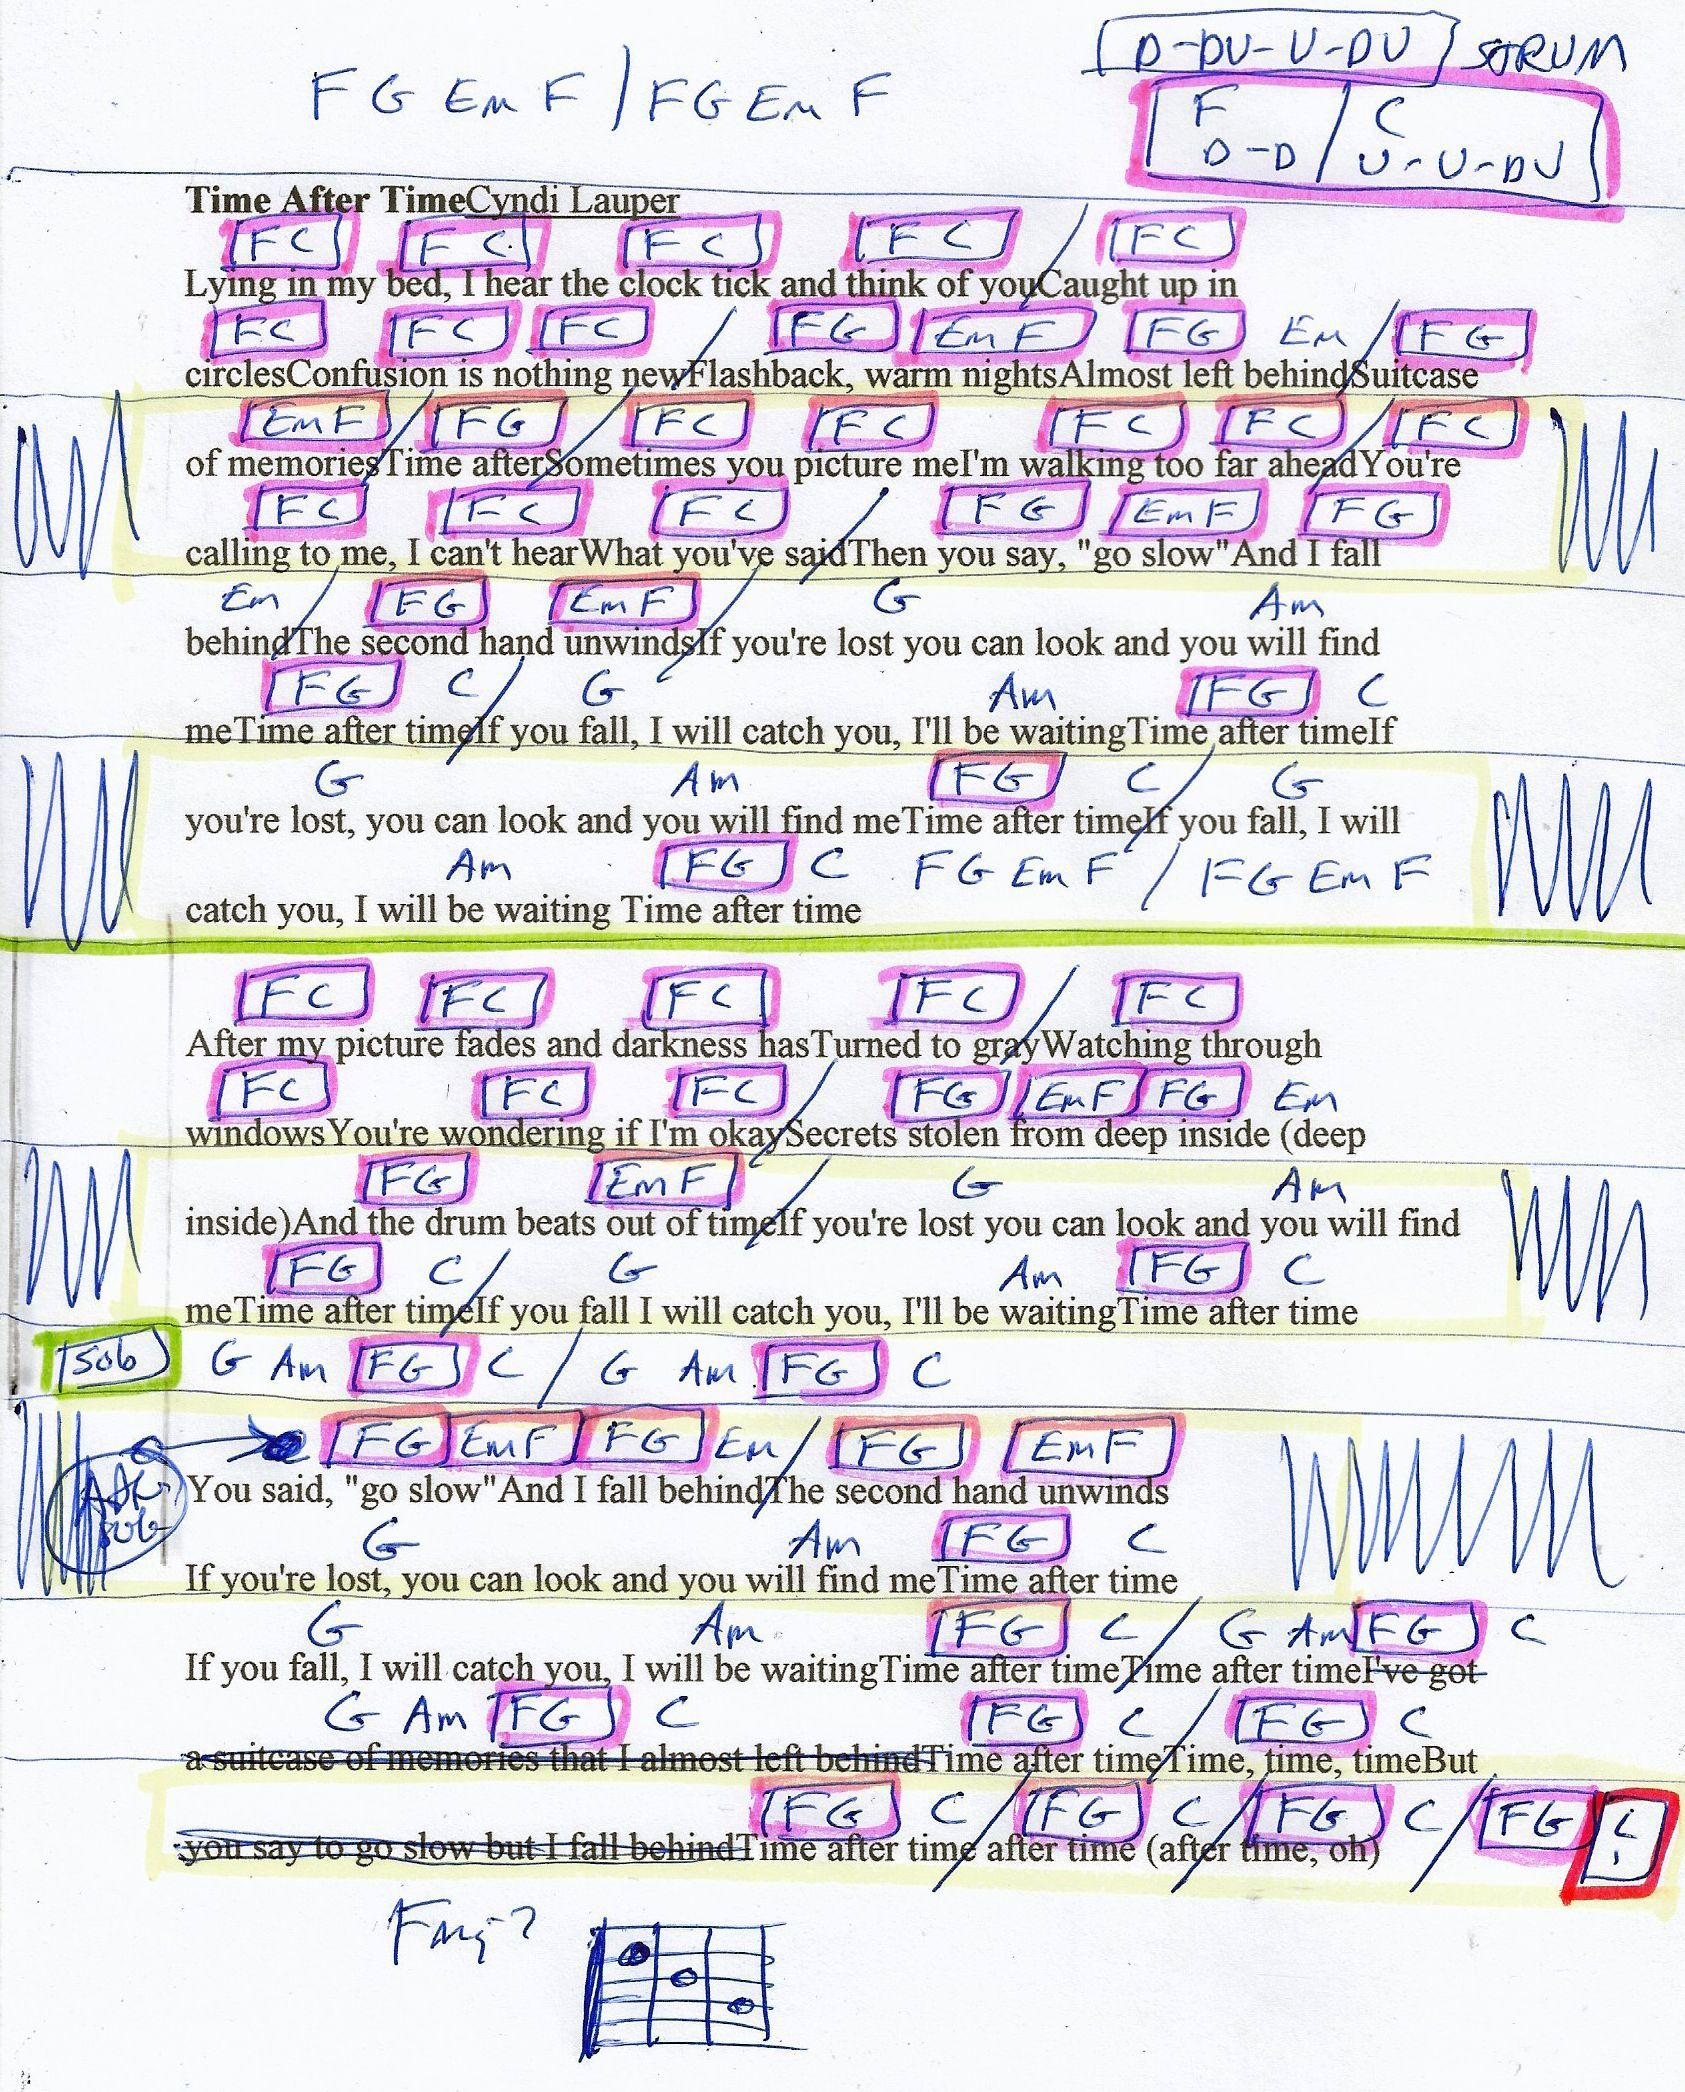 Time After Time Cyndi Lauper Guitar Chord Chart   Guitar chord ...